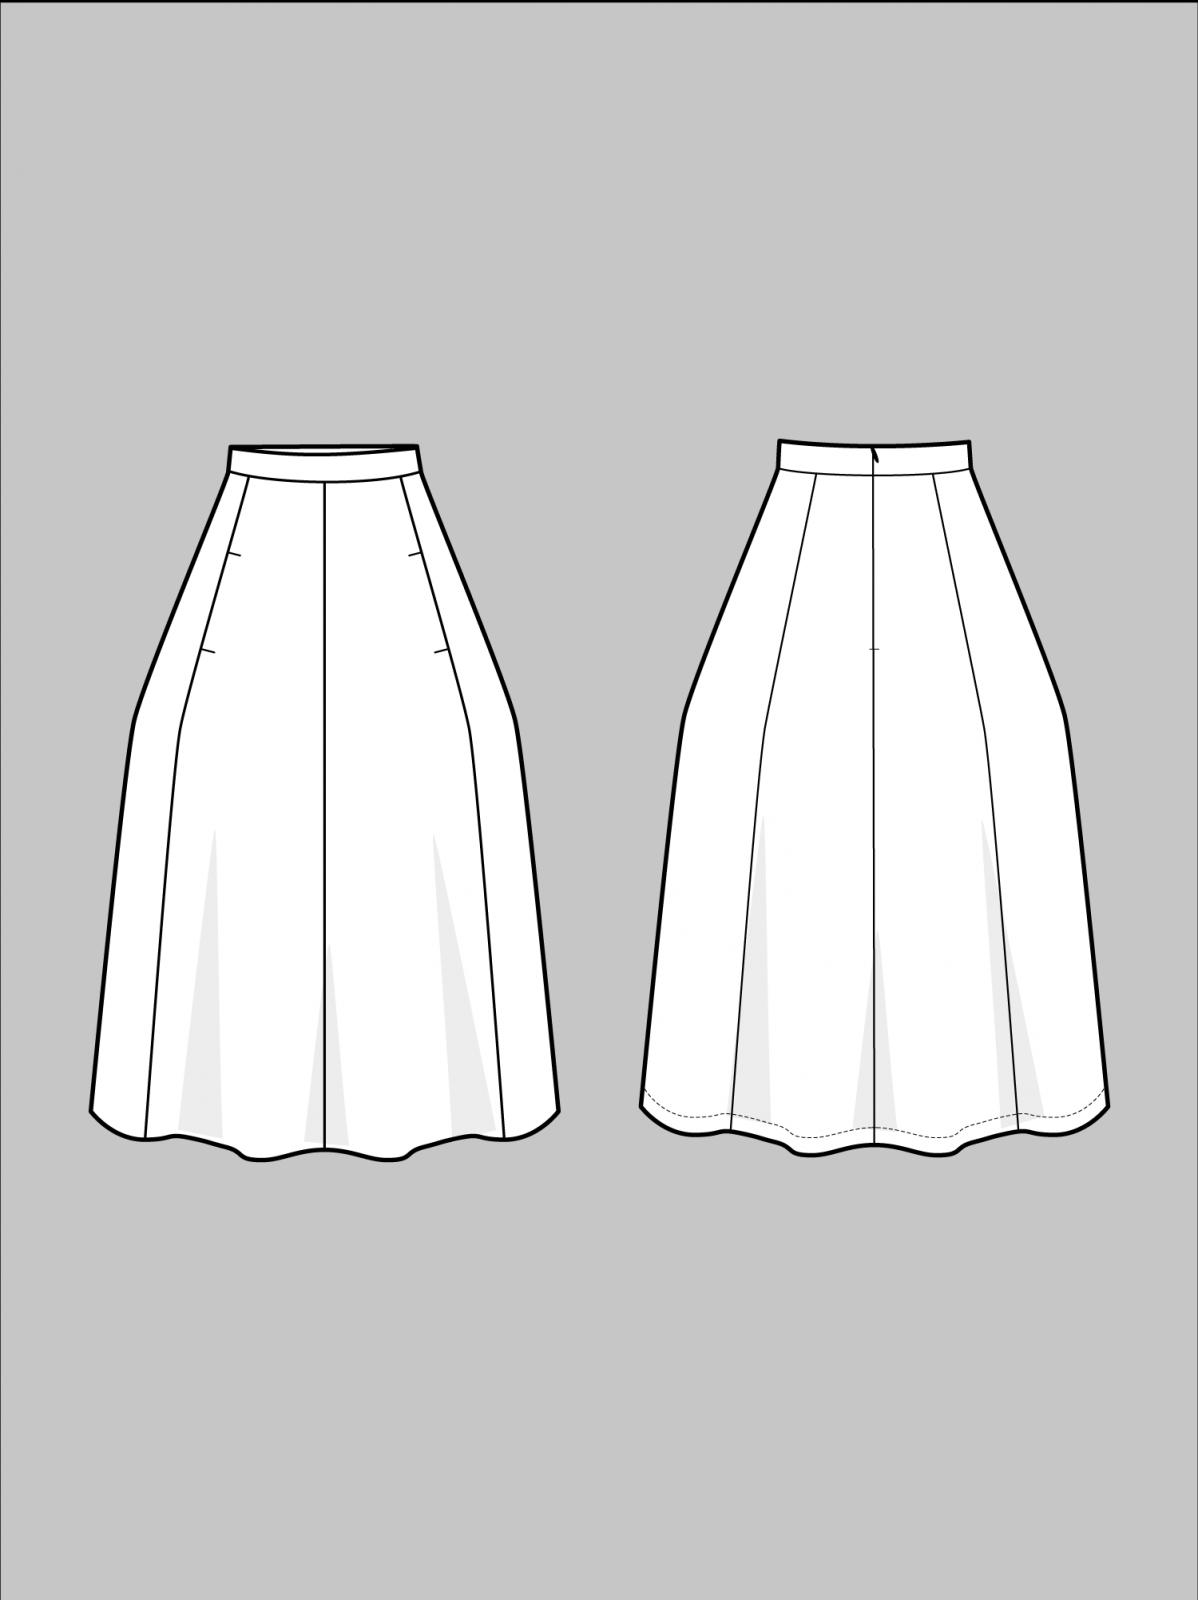 TAL S402 Tulip Skirt